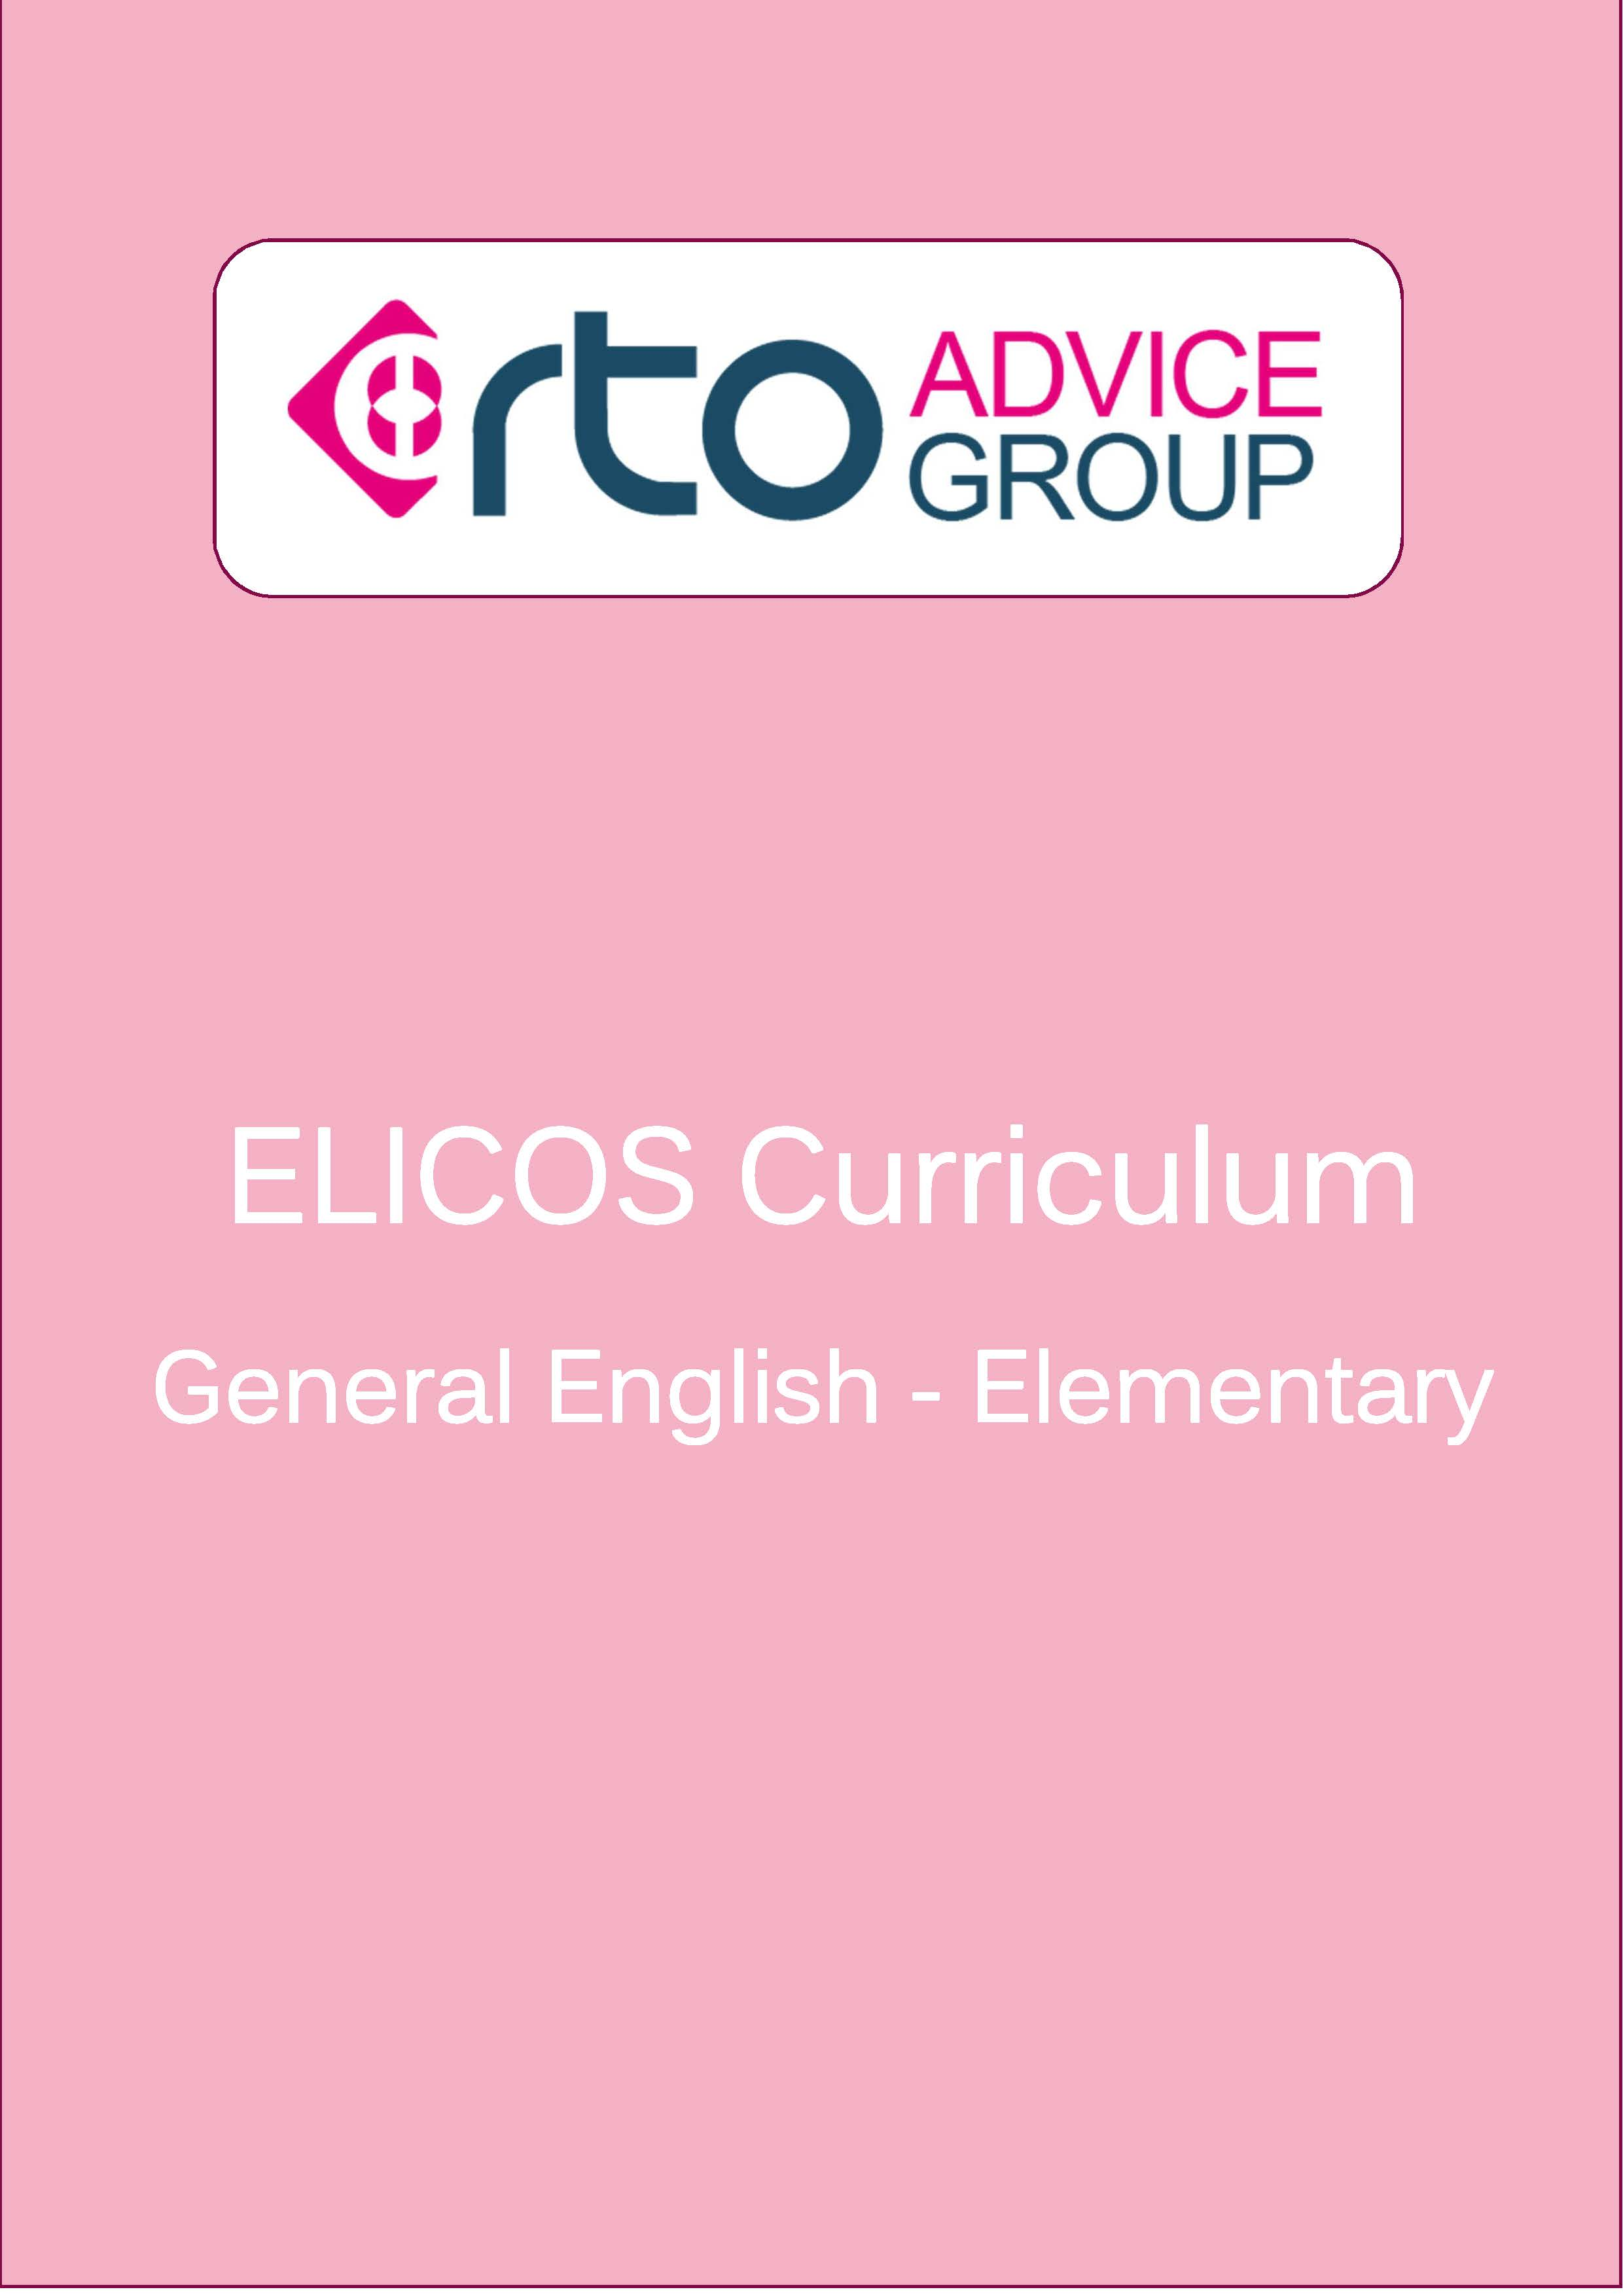 ELICOS Curriculum – General English Elementary